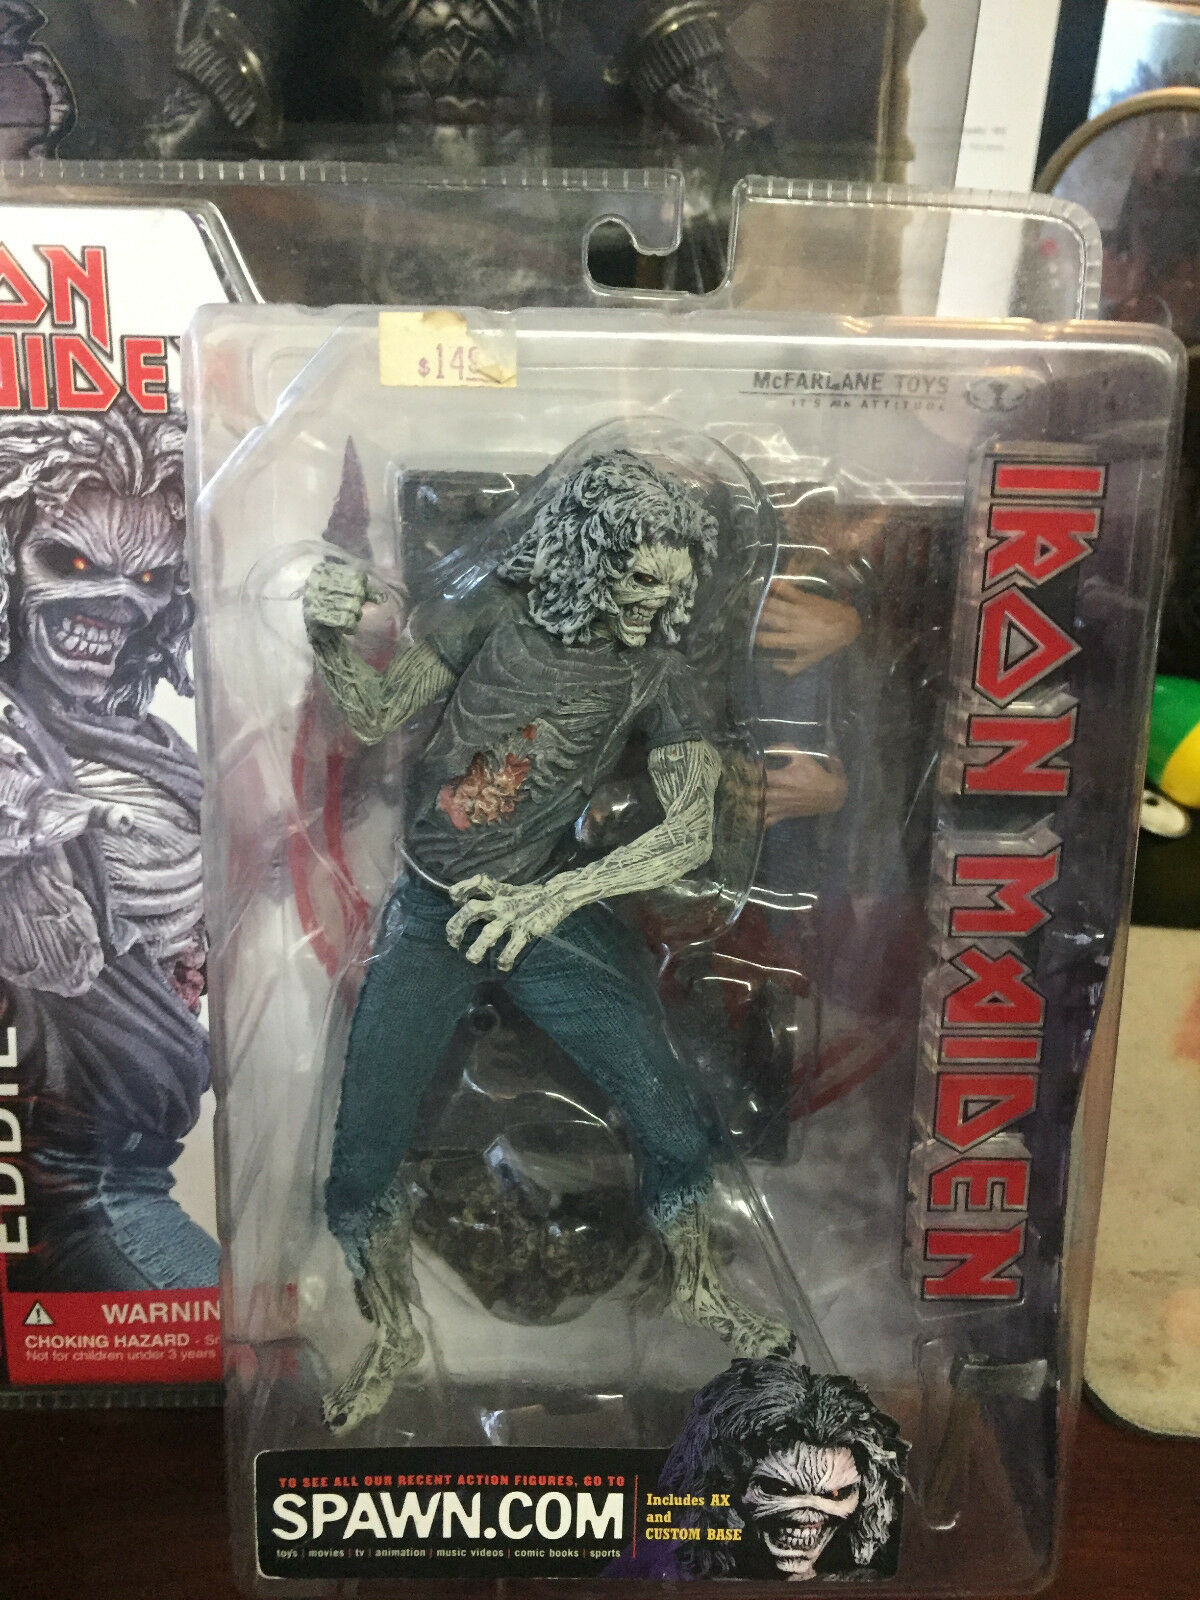 Mcfarlane -- Iron Maiden -- Eddie Killers figure NEW IN BOX